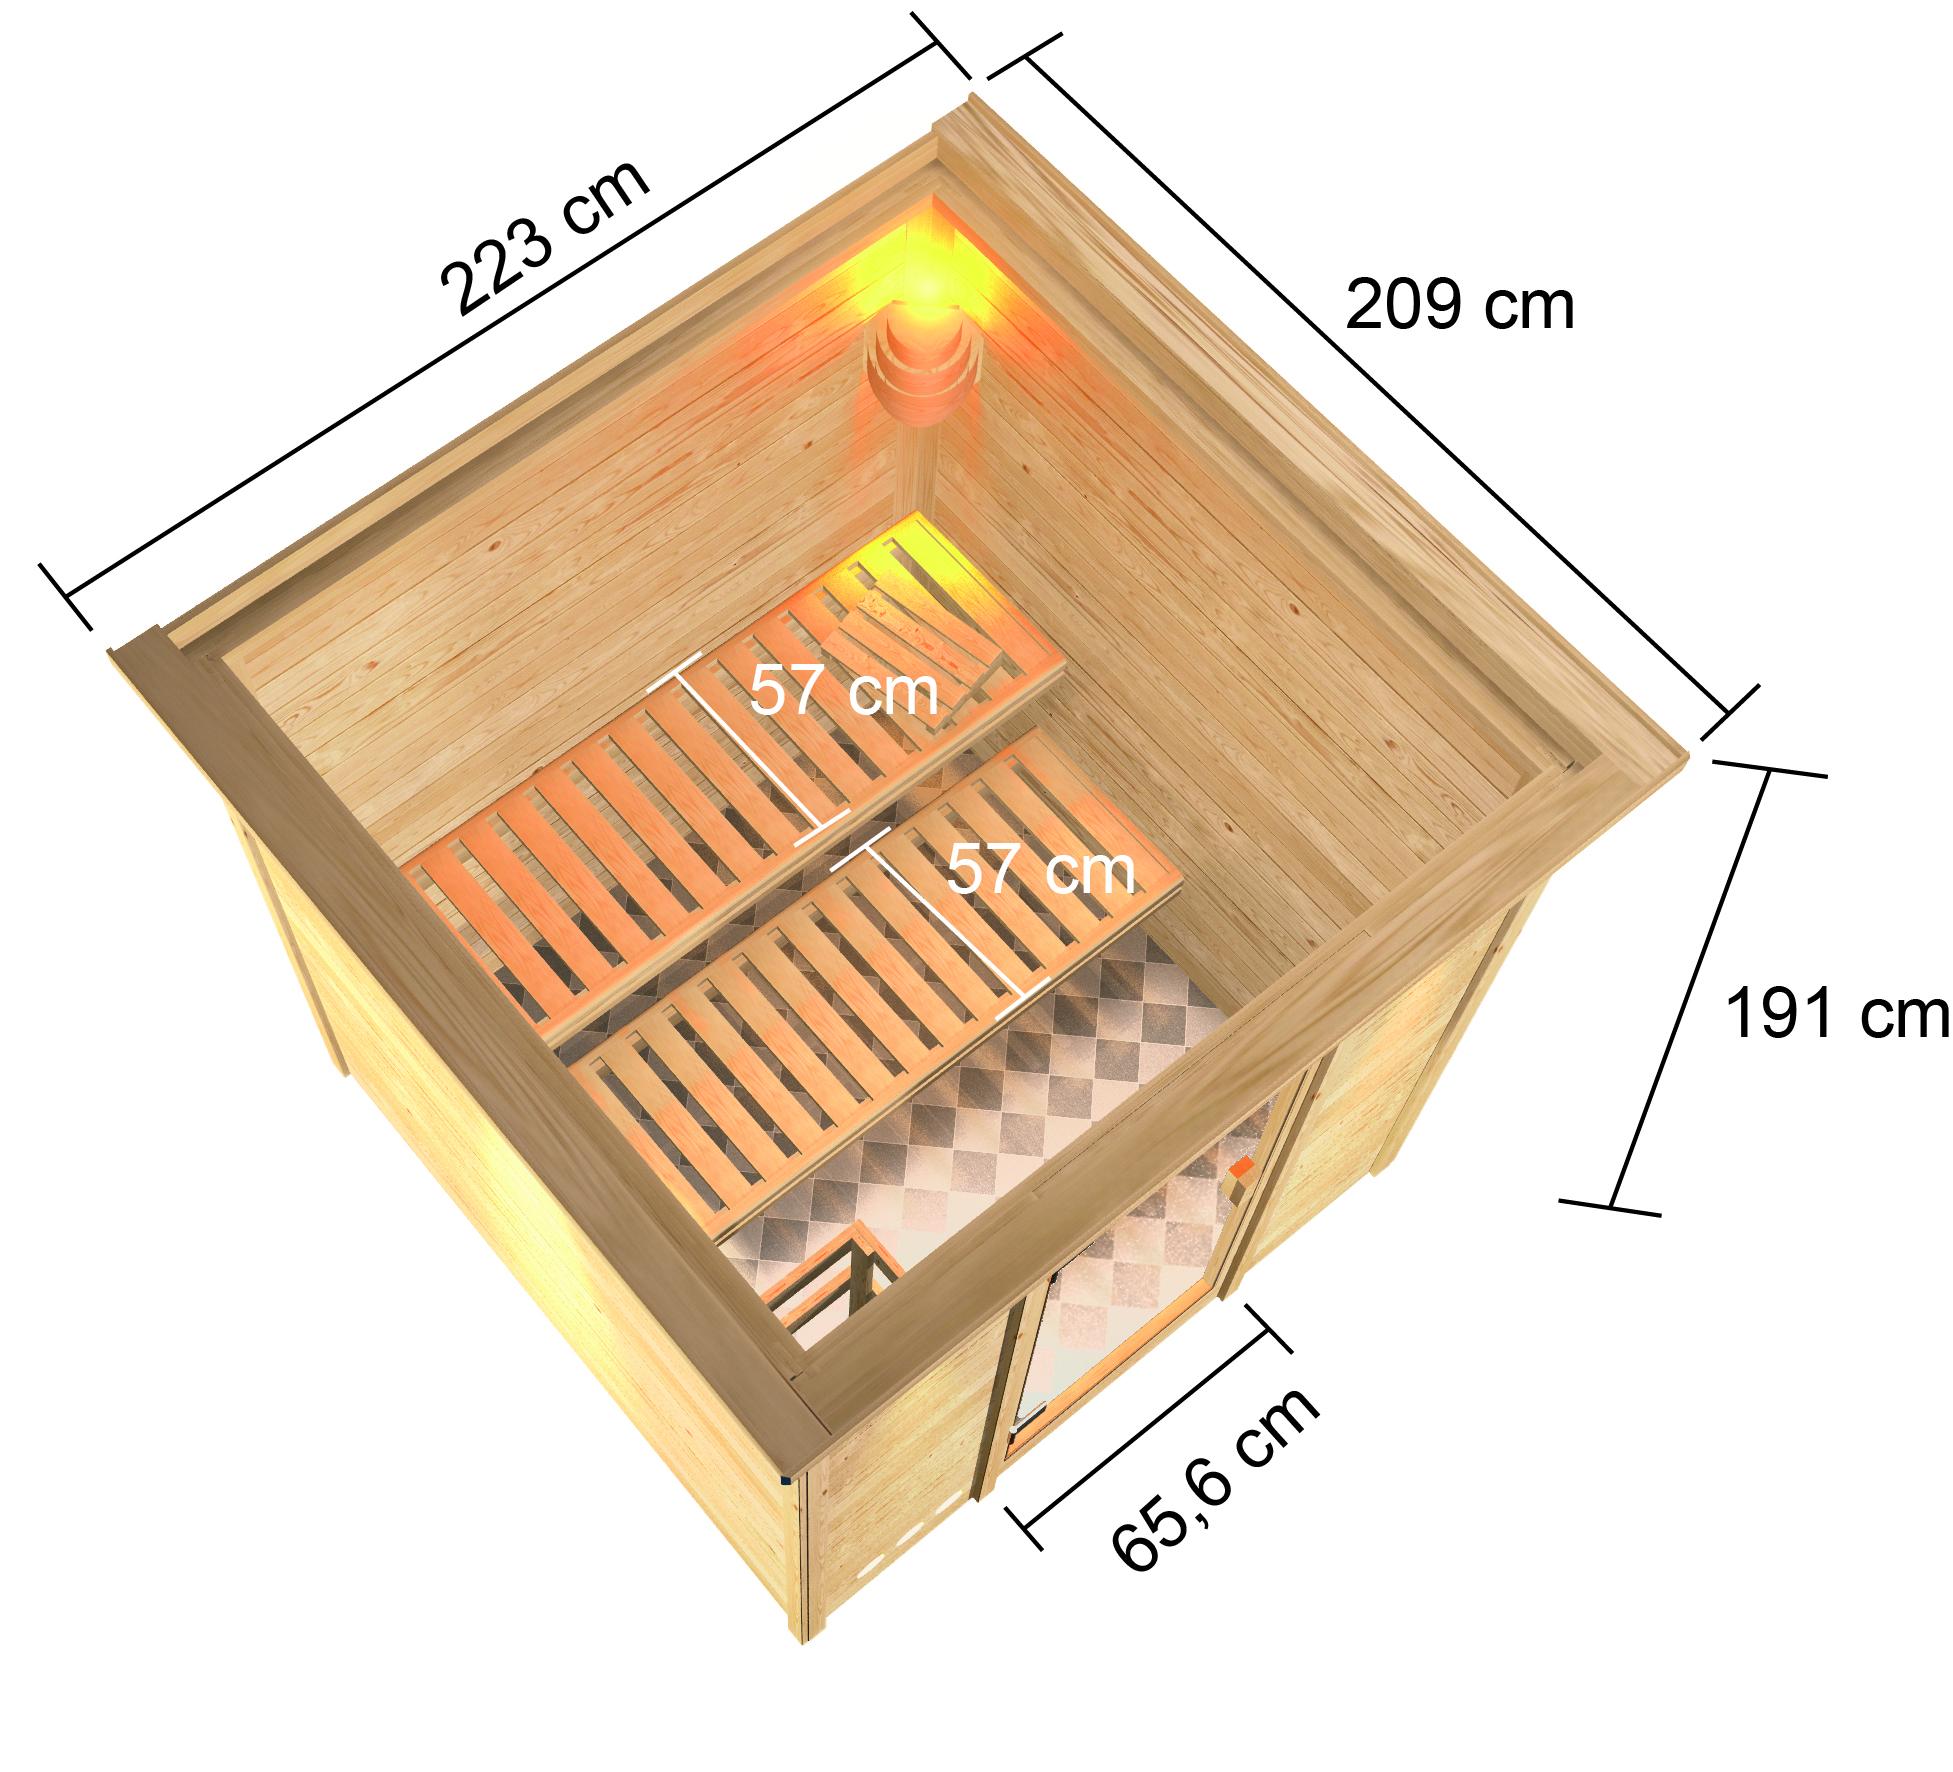 Woodfeeling Sauna Jara 38mm Dachkranz Saunaofen 9 kW extern Bild 8